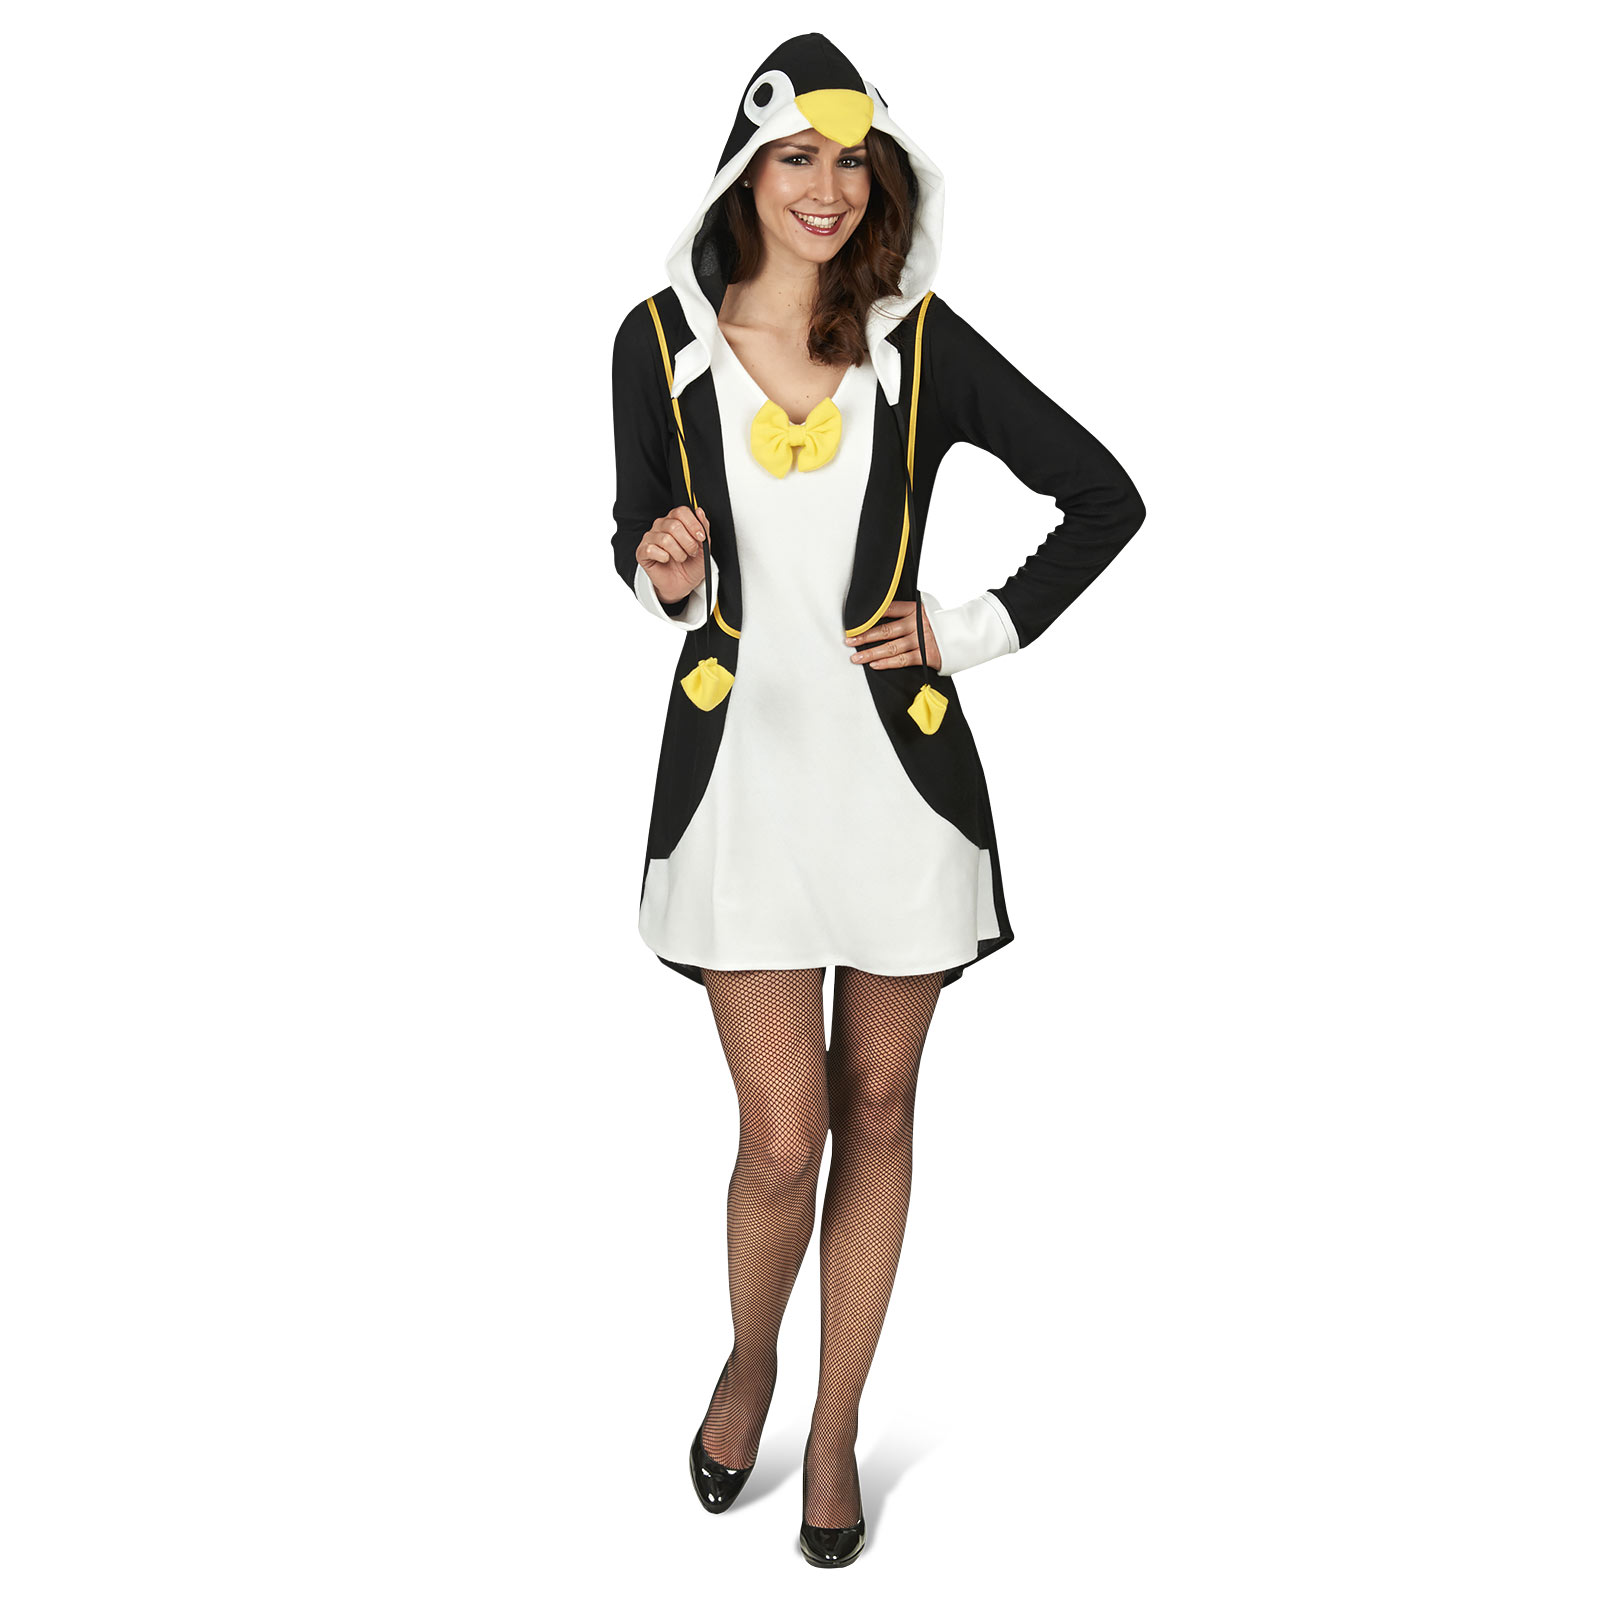 Pinguin Kostümkleid mit Kapuze